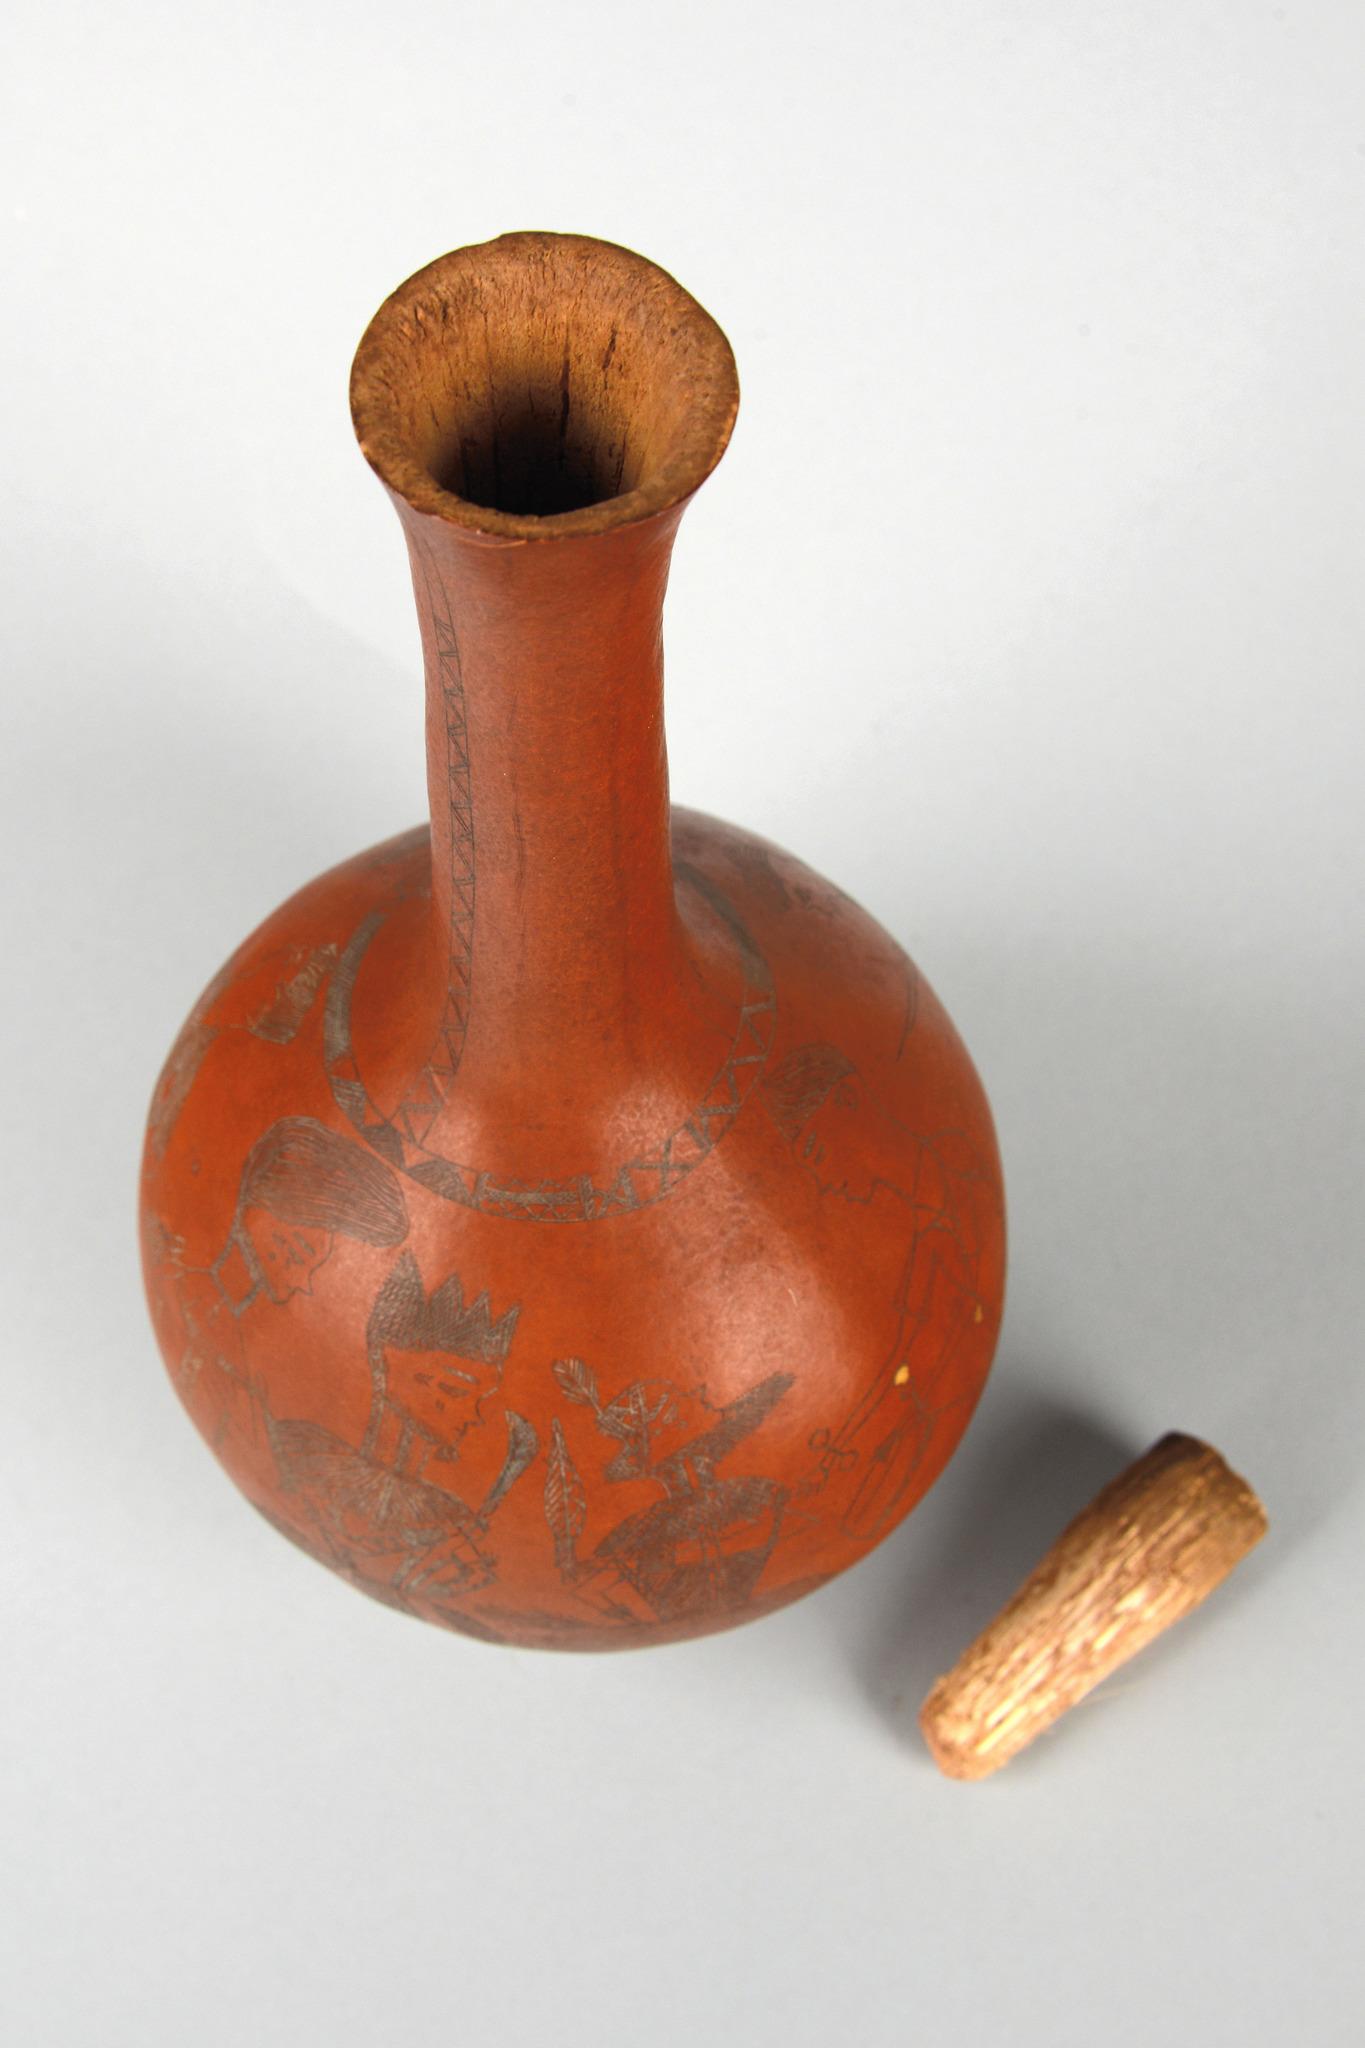 Artistically engraved calabash